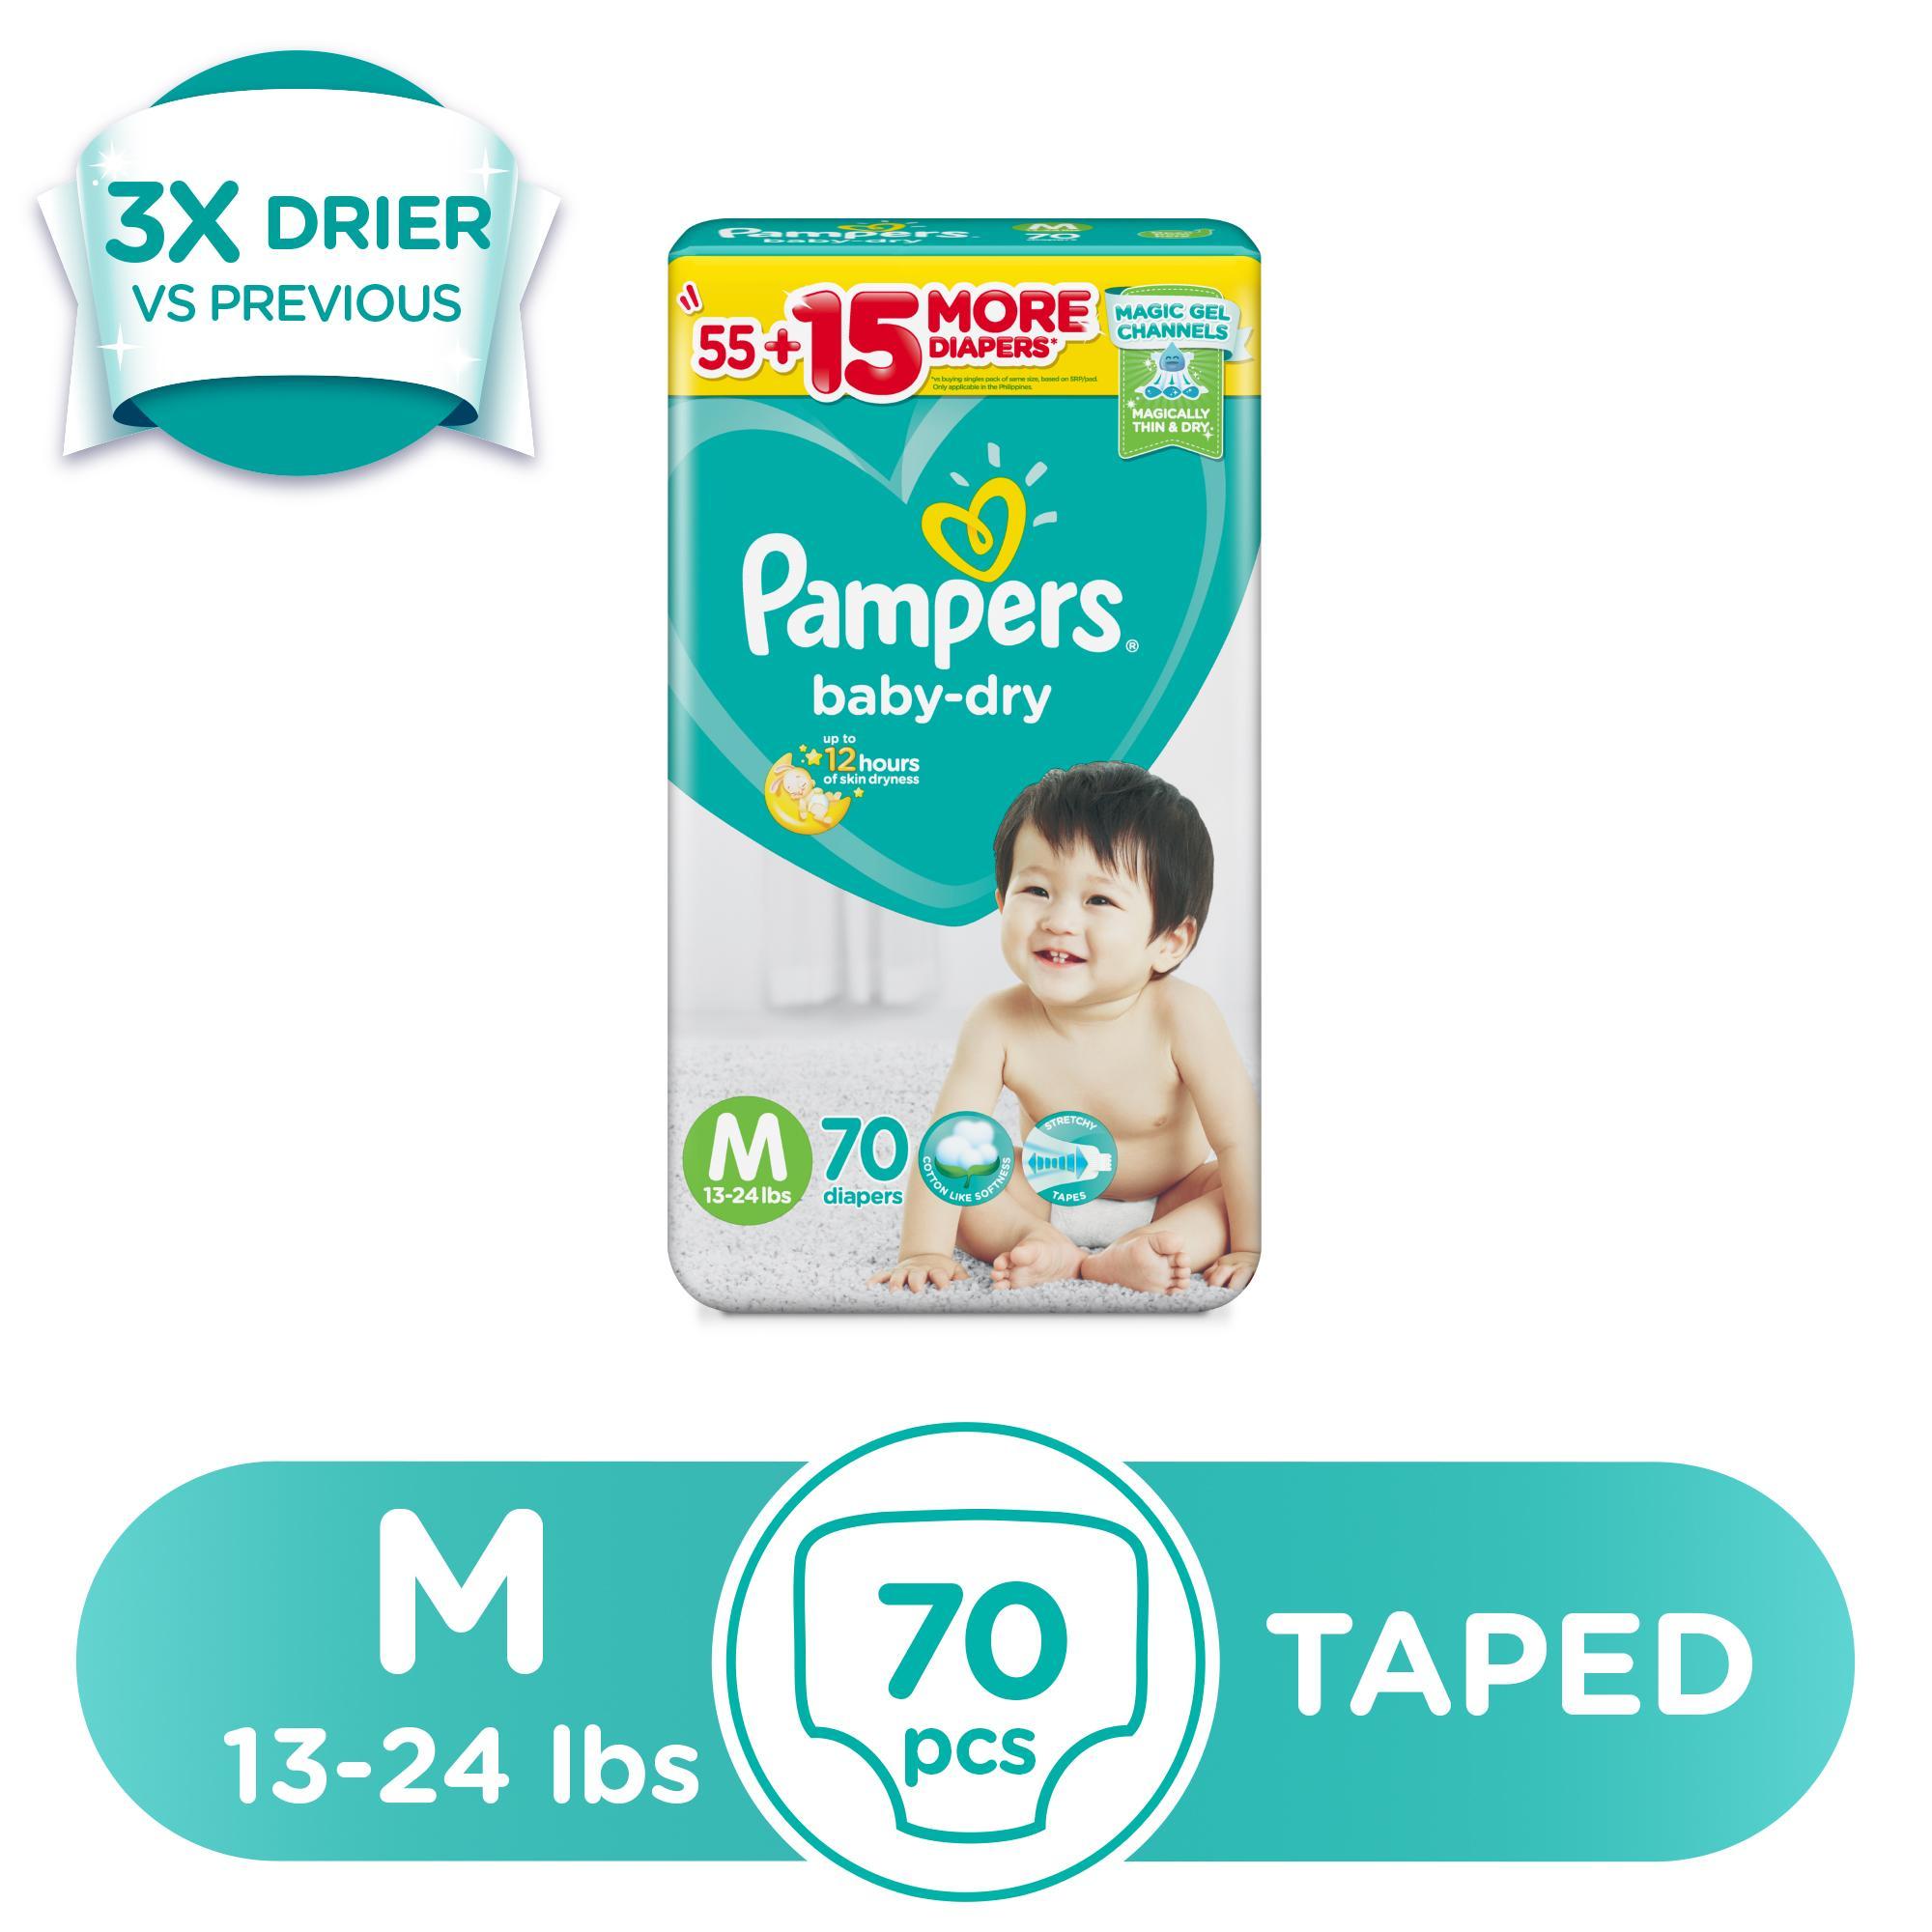 Pampers Baby Dry Medium (13-24 lbs) - 70 pcs x 1 pack